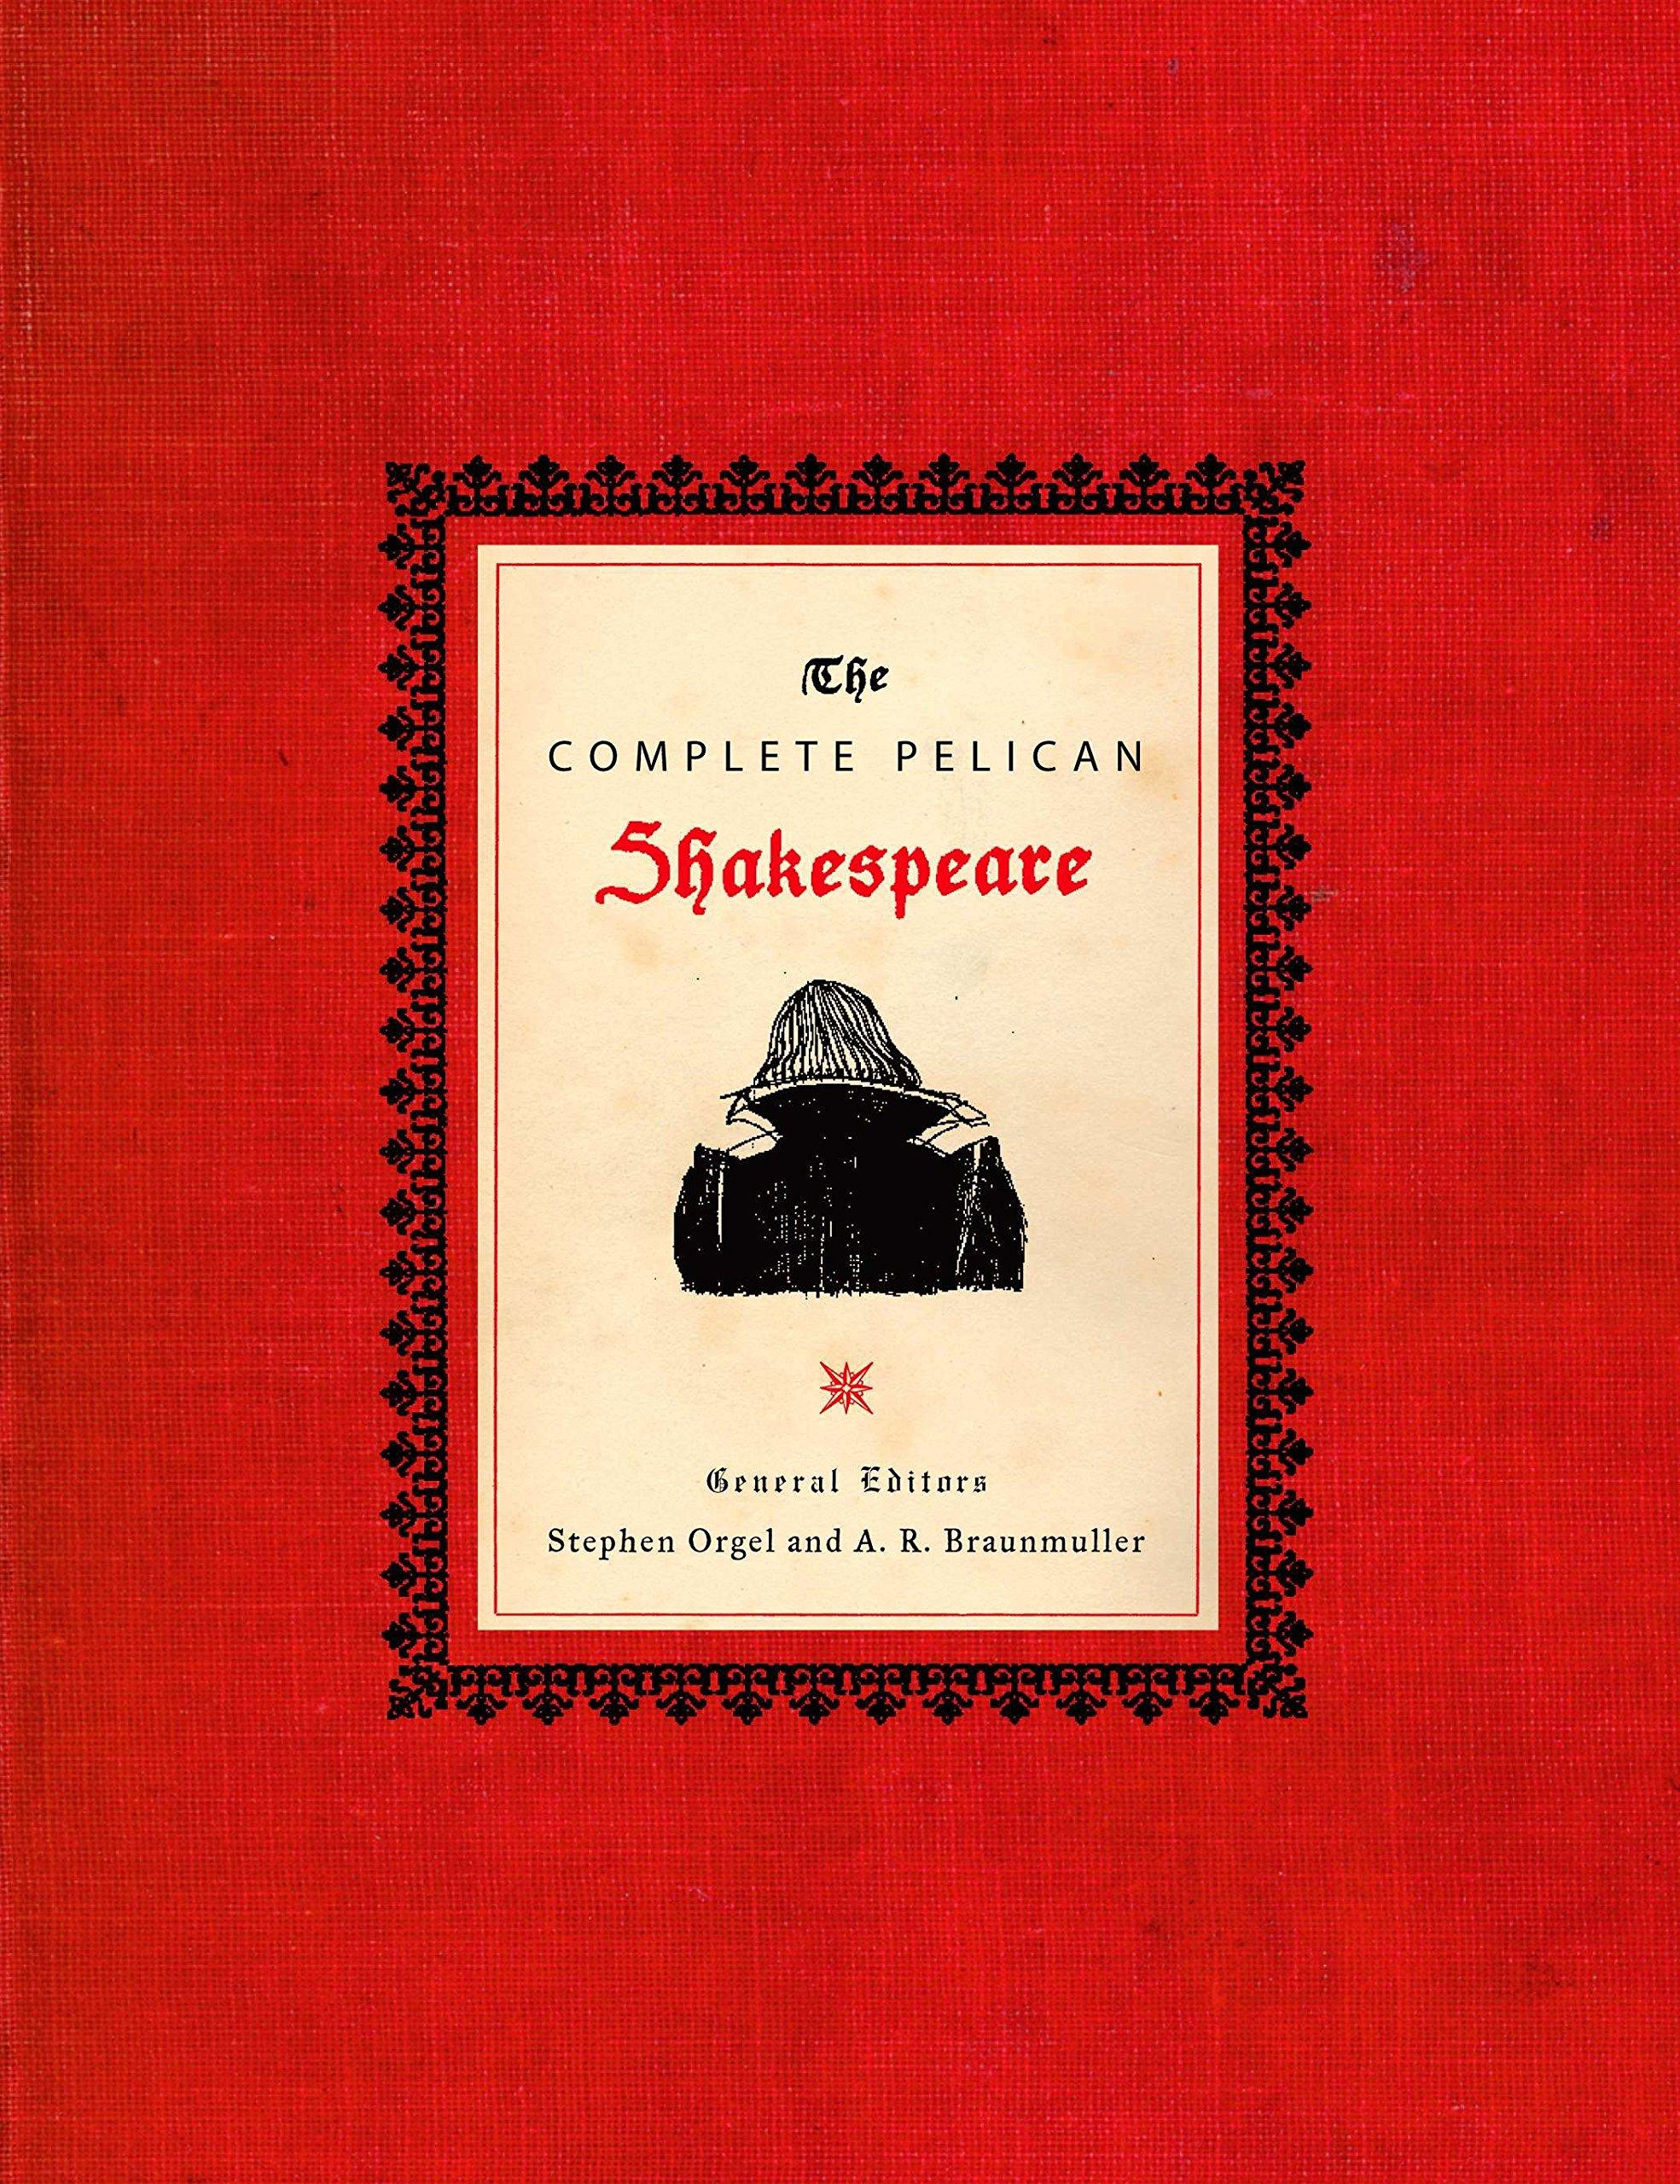 The Complete Pelican Shakespeare William Shakespeare Stephen Orgel